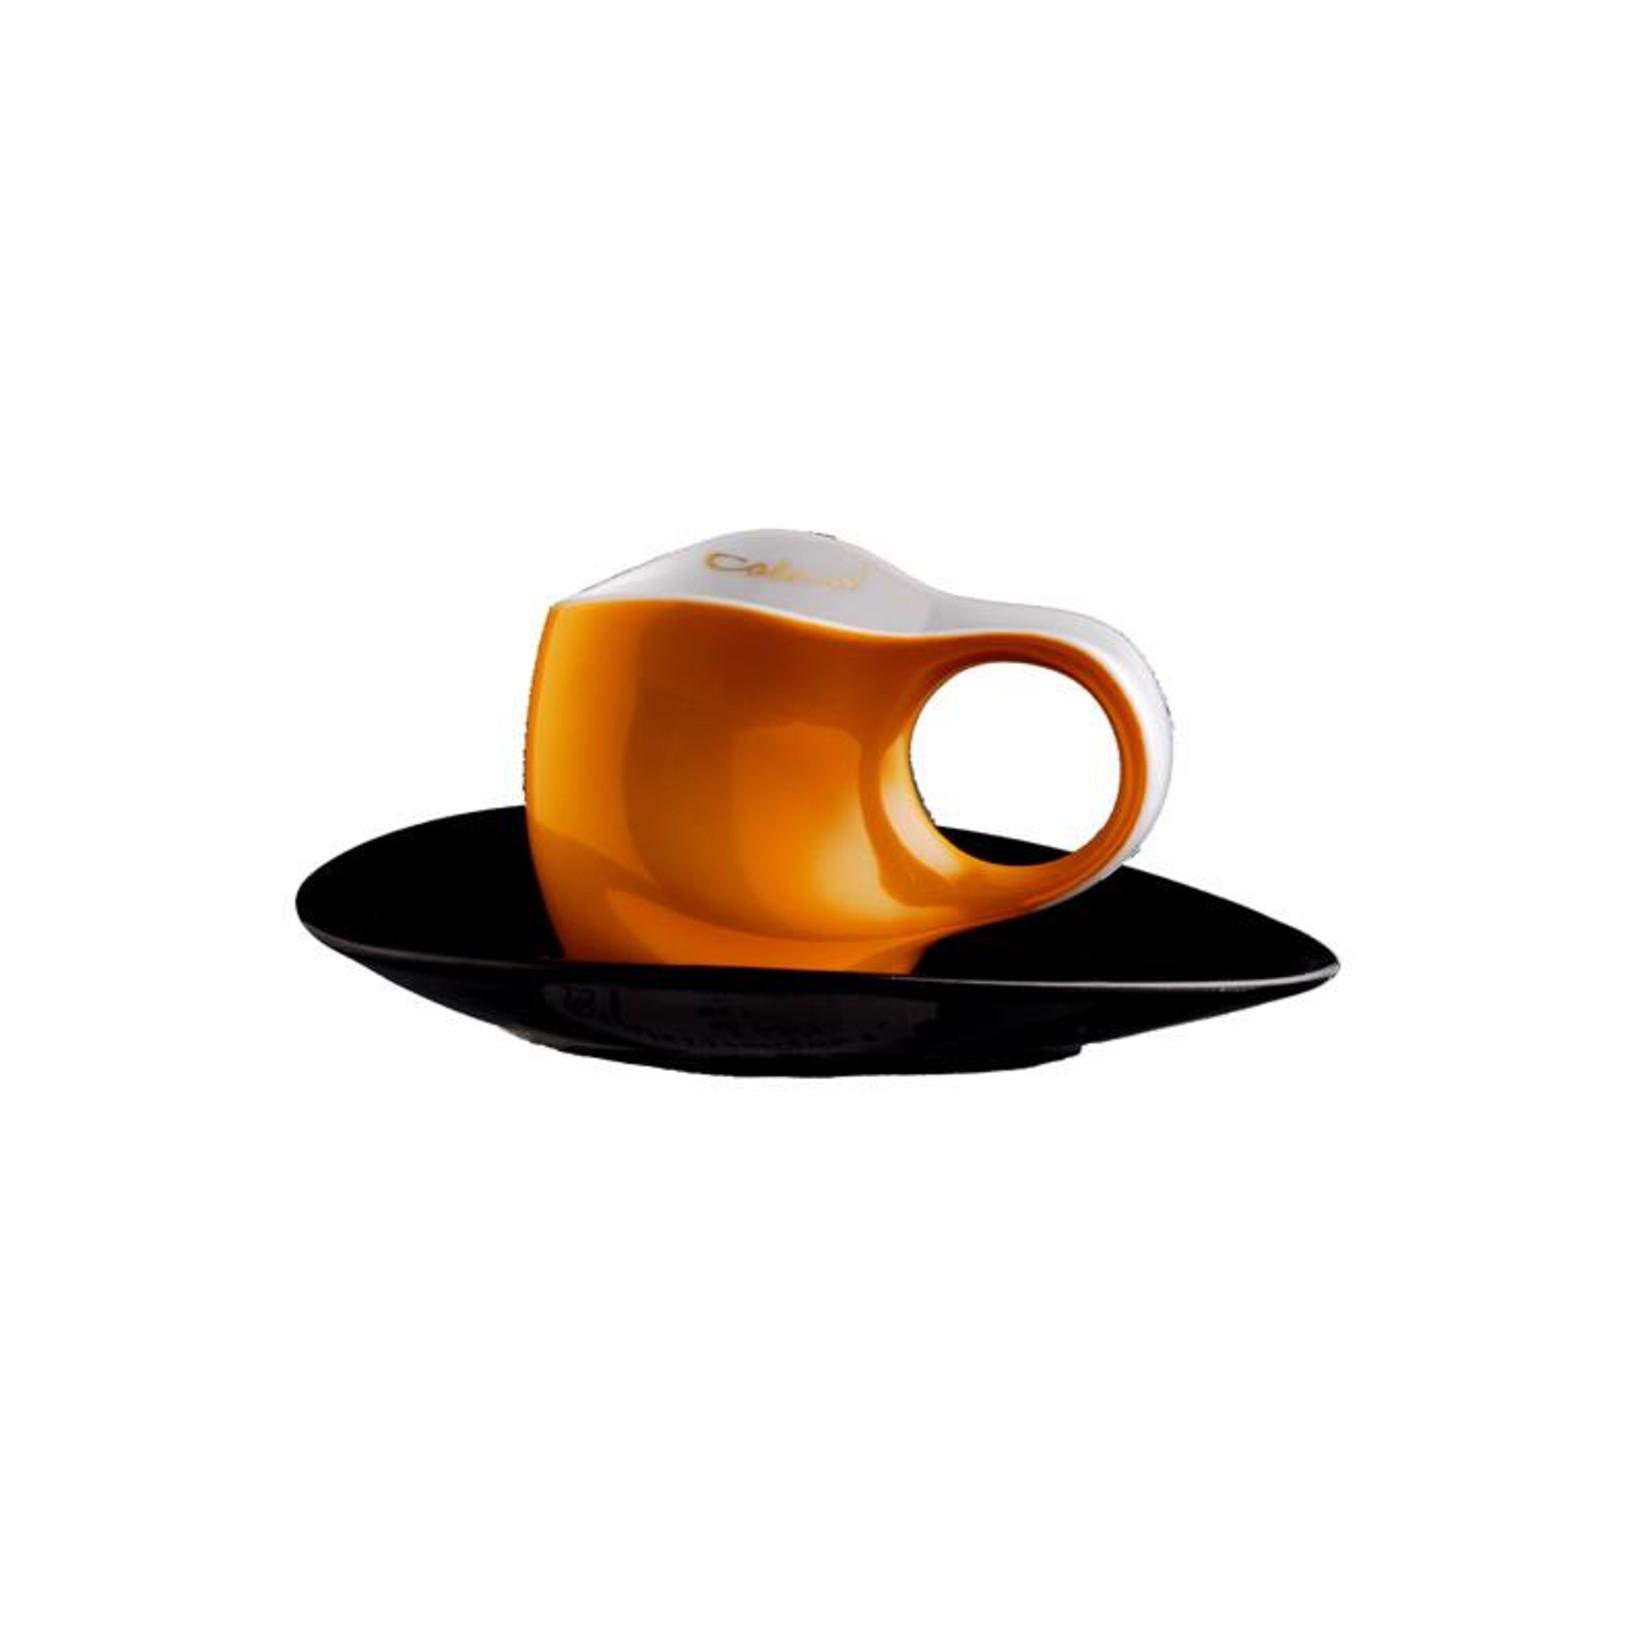 Colani Porzellanserie Colani Espressotasse   Tasse inkl. Unterteller   orange